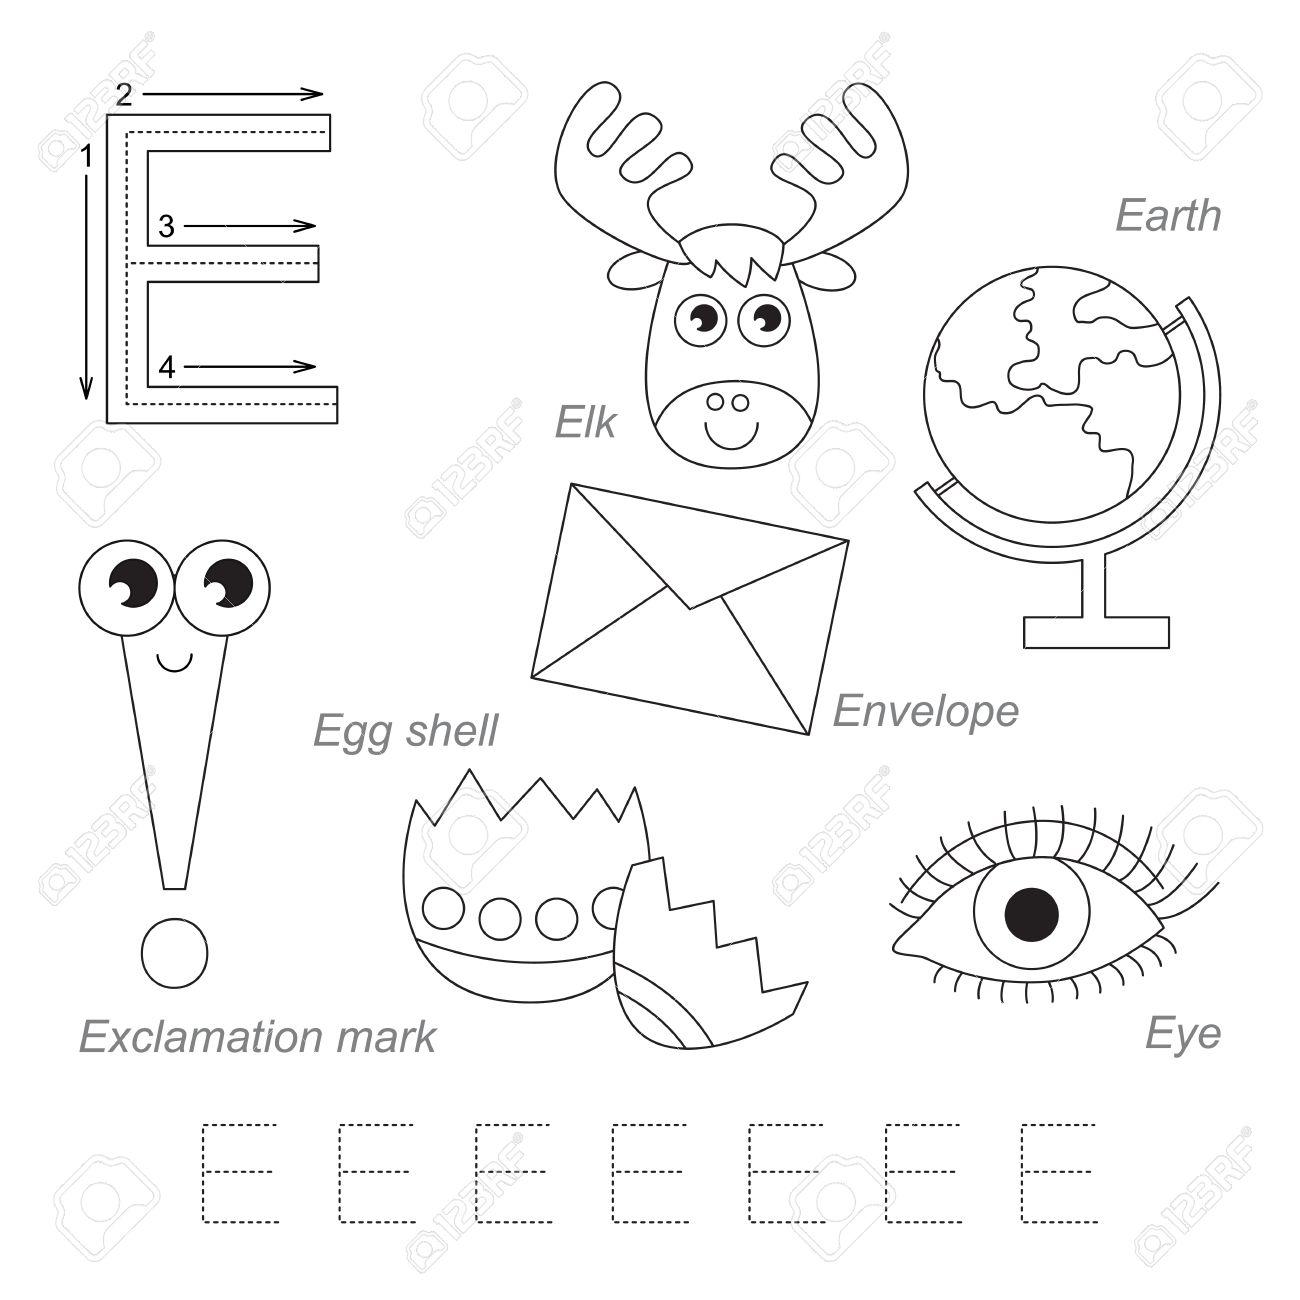 worksheet Letter E Worksheet tracing worksheet for children full english alphabet from a to z pictures letter